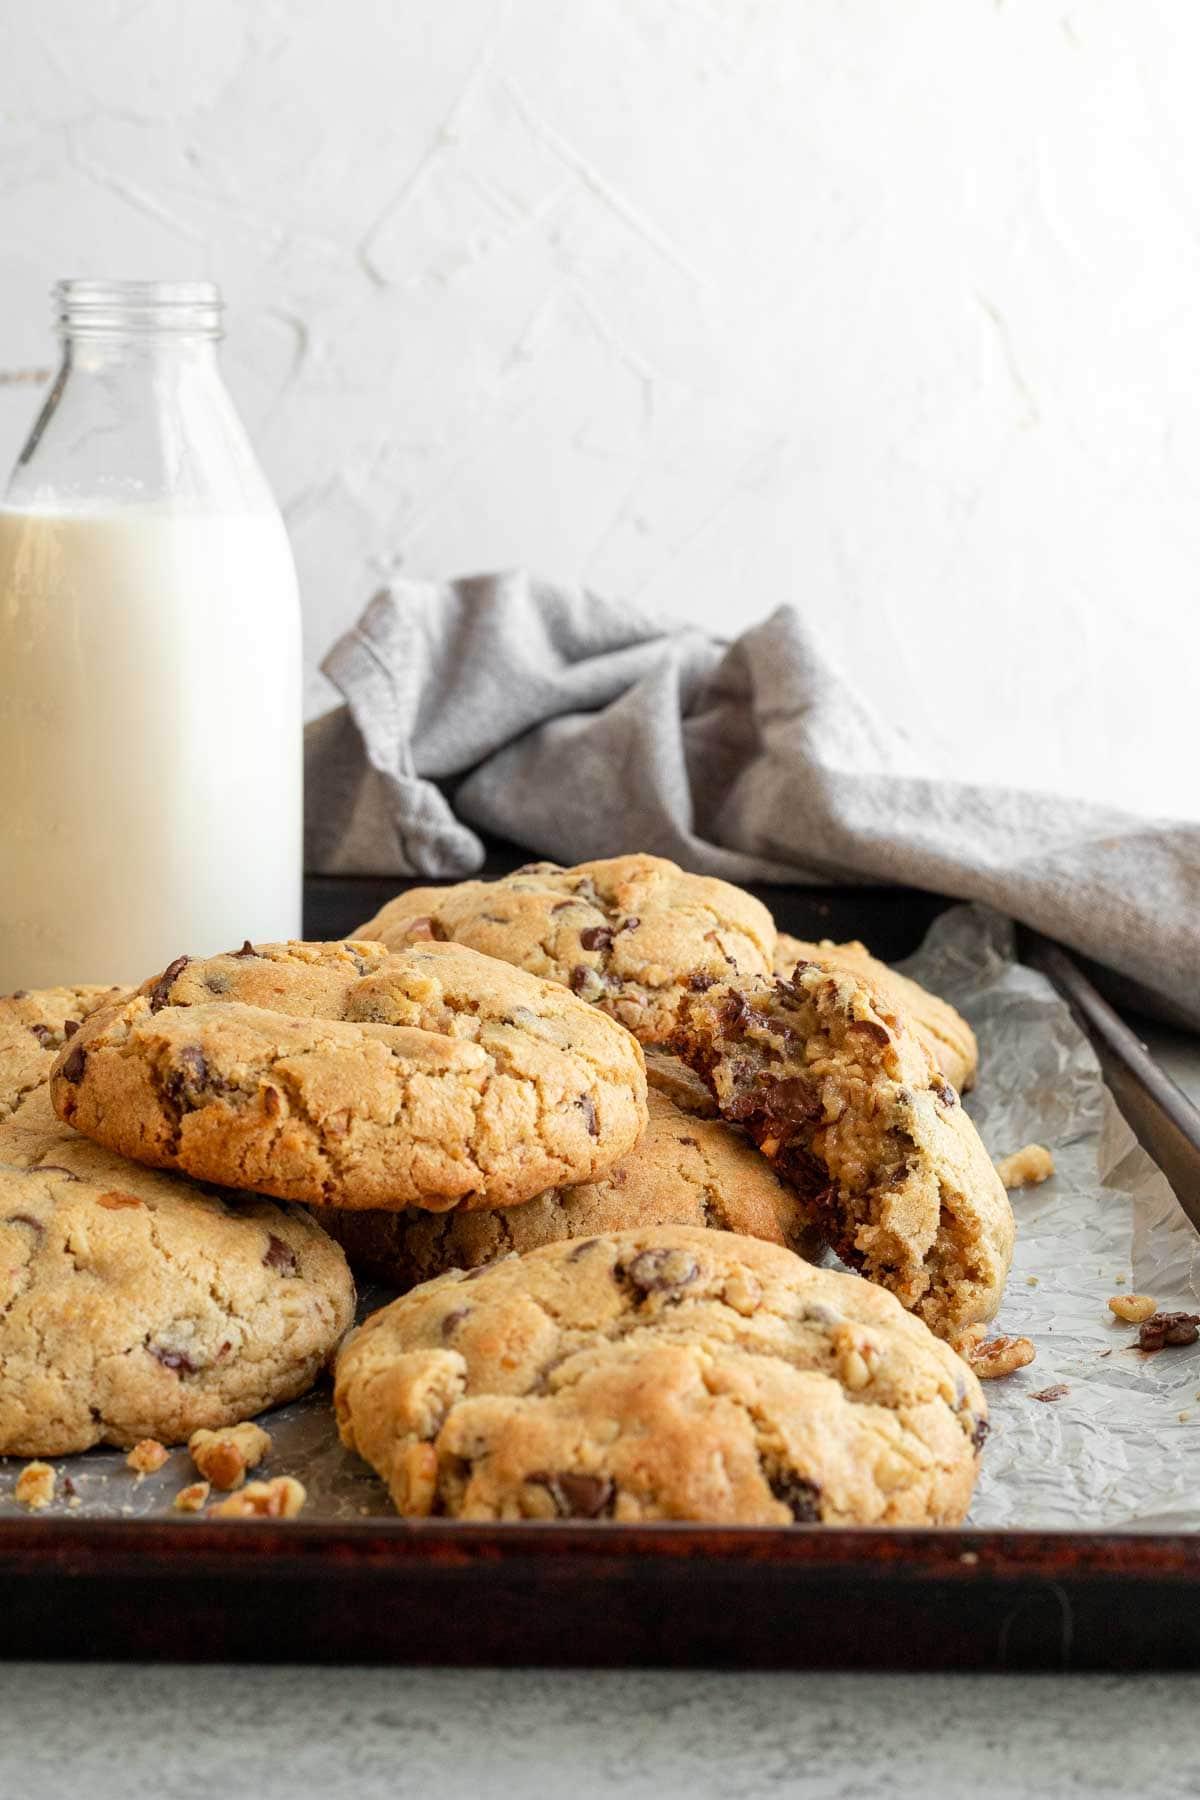 Levain Chocolate Chip Cookies on baking sheet